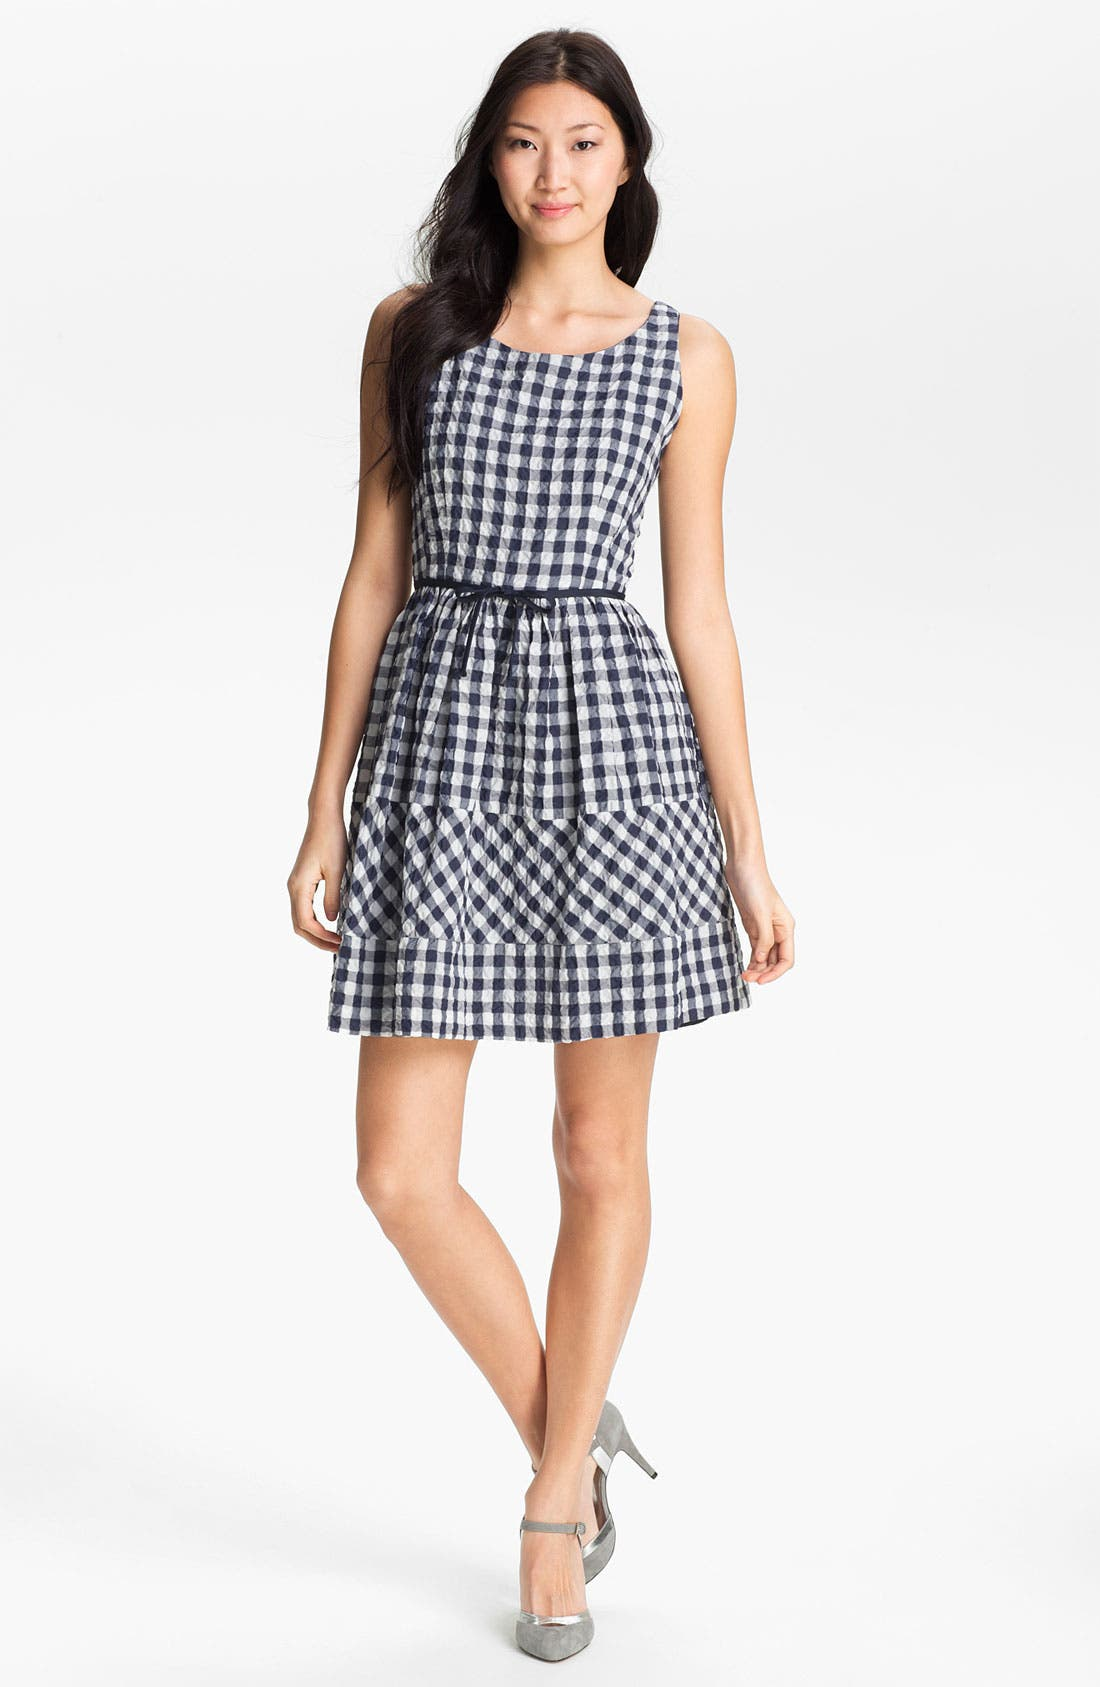 Alternate Image 1 Selected - Taylor Dresses Gingham Fit & Flare Dress